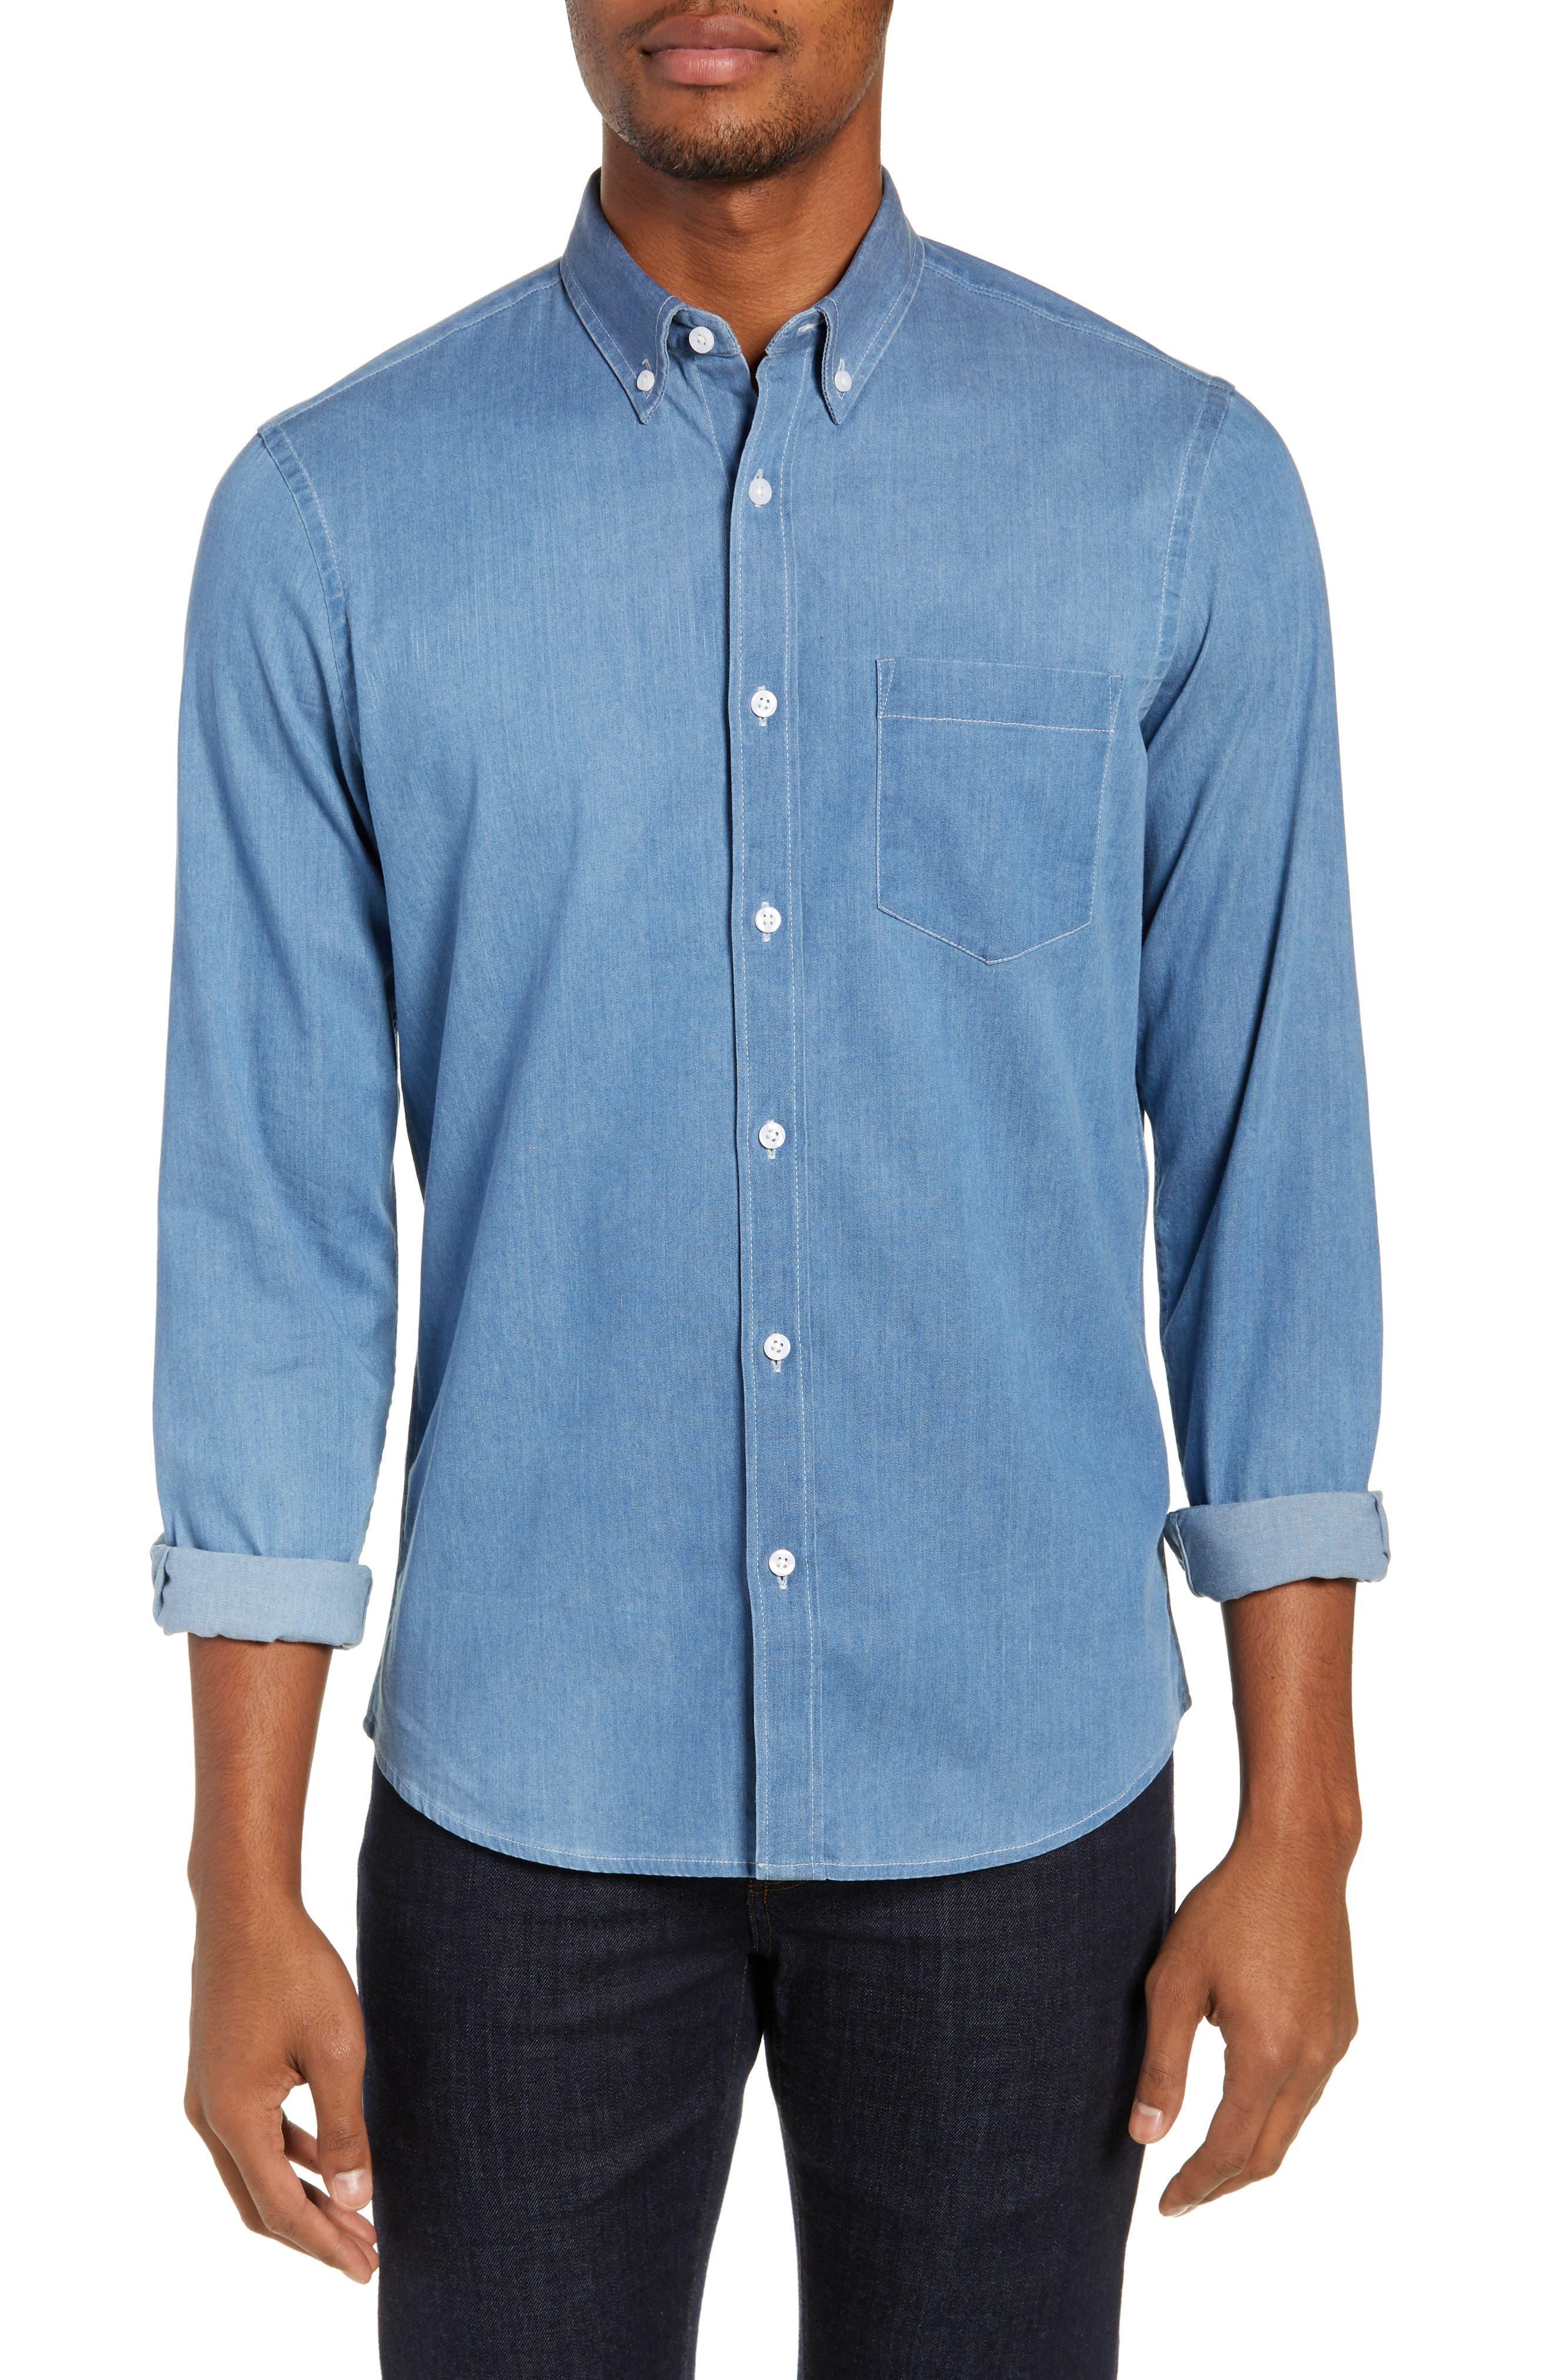 Slim Fit Chambray Sport Shirt,                             Main thumbnail 1, color,                             BLUE HEAVEN CHAMBRAY